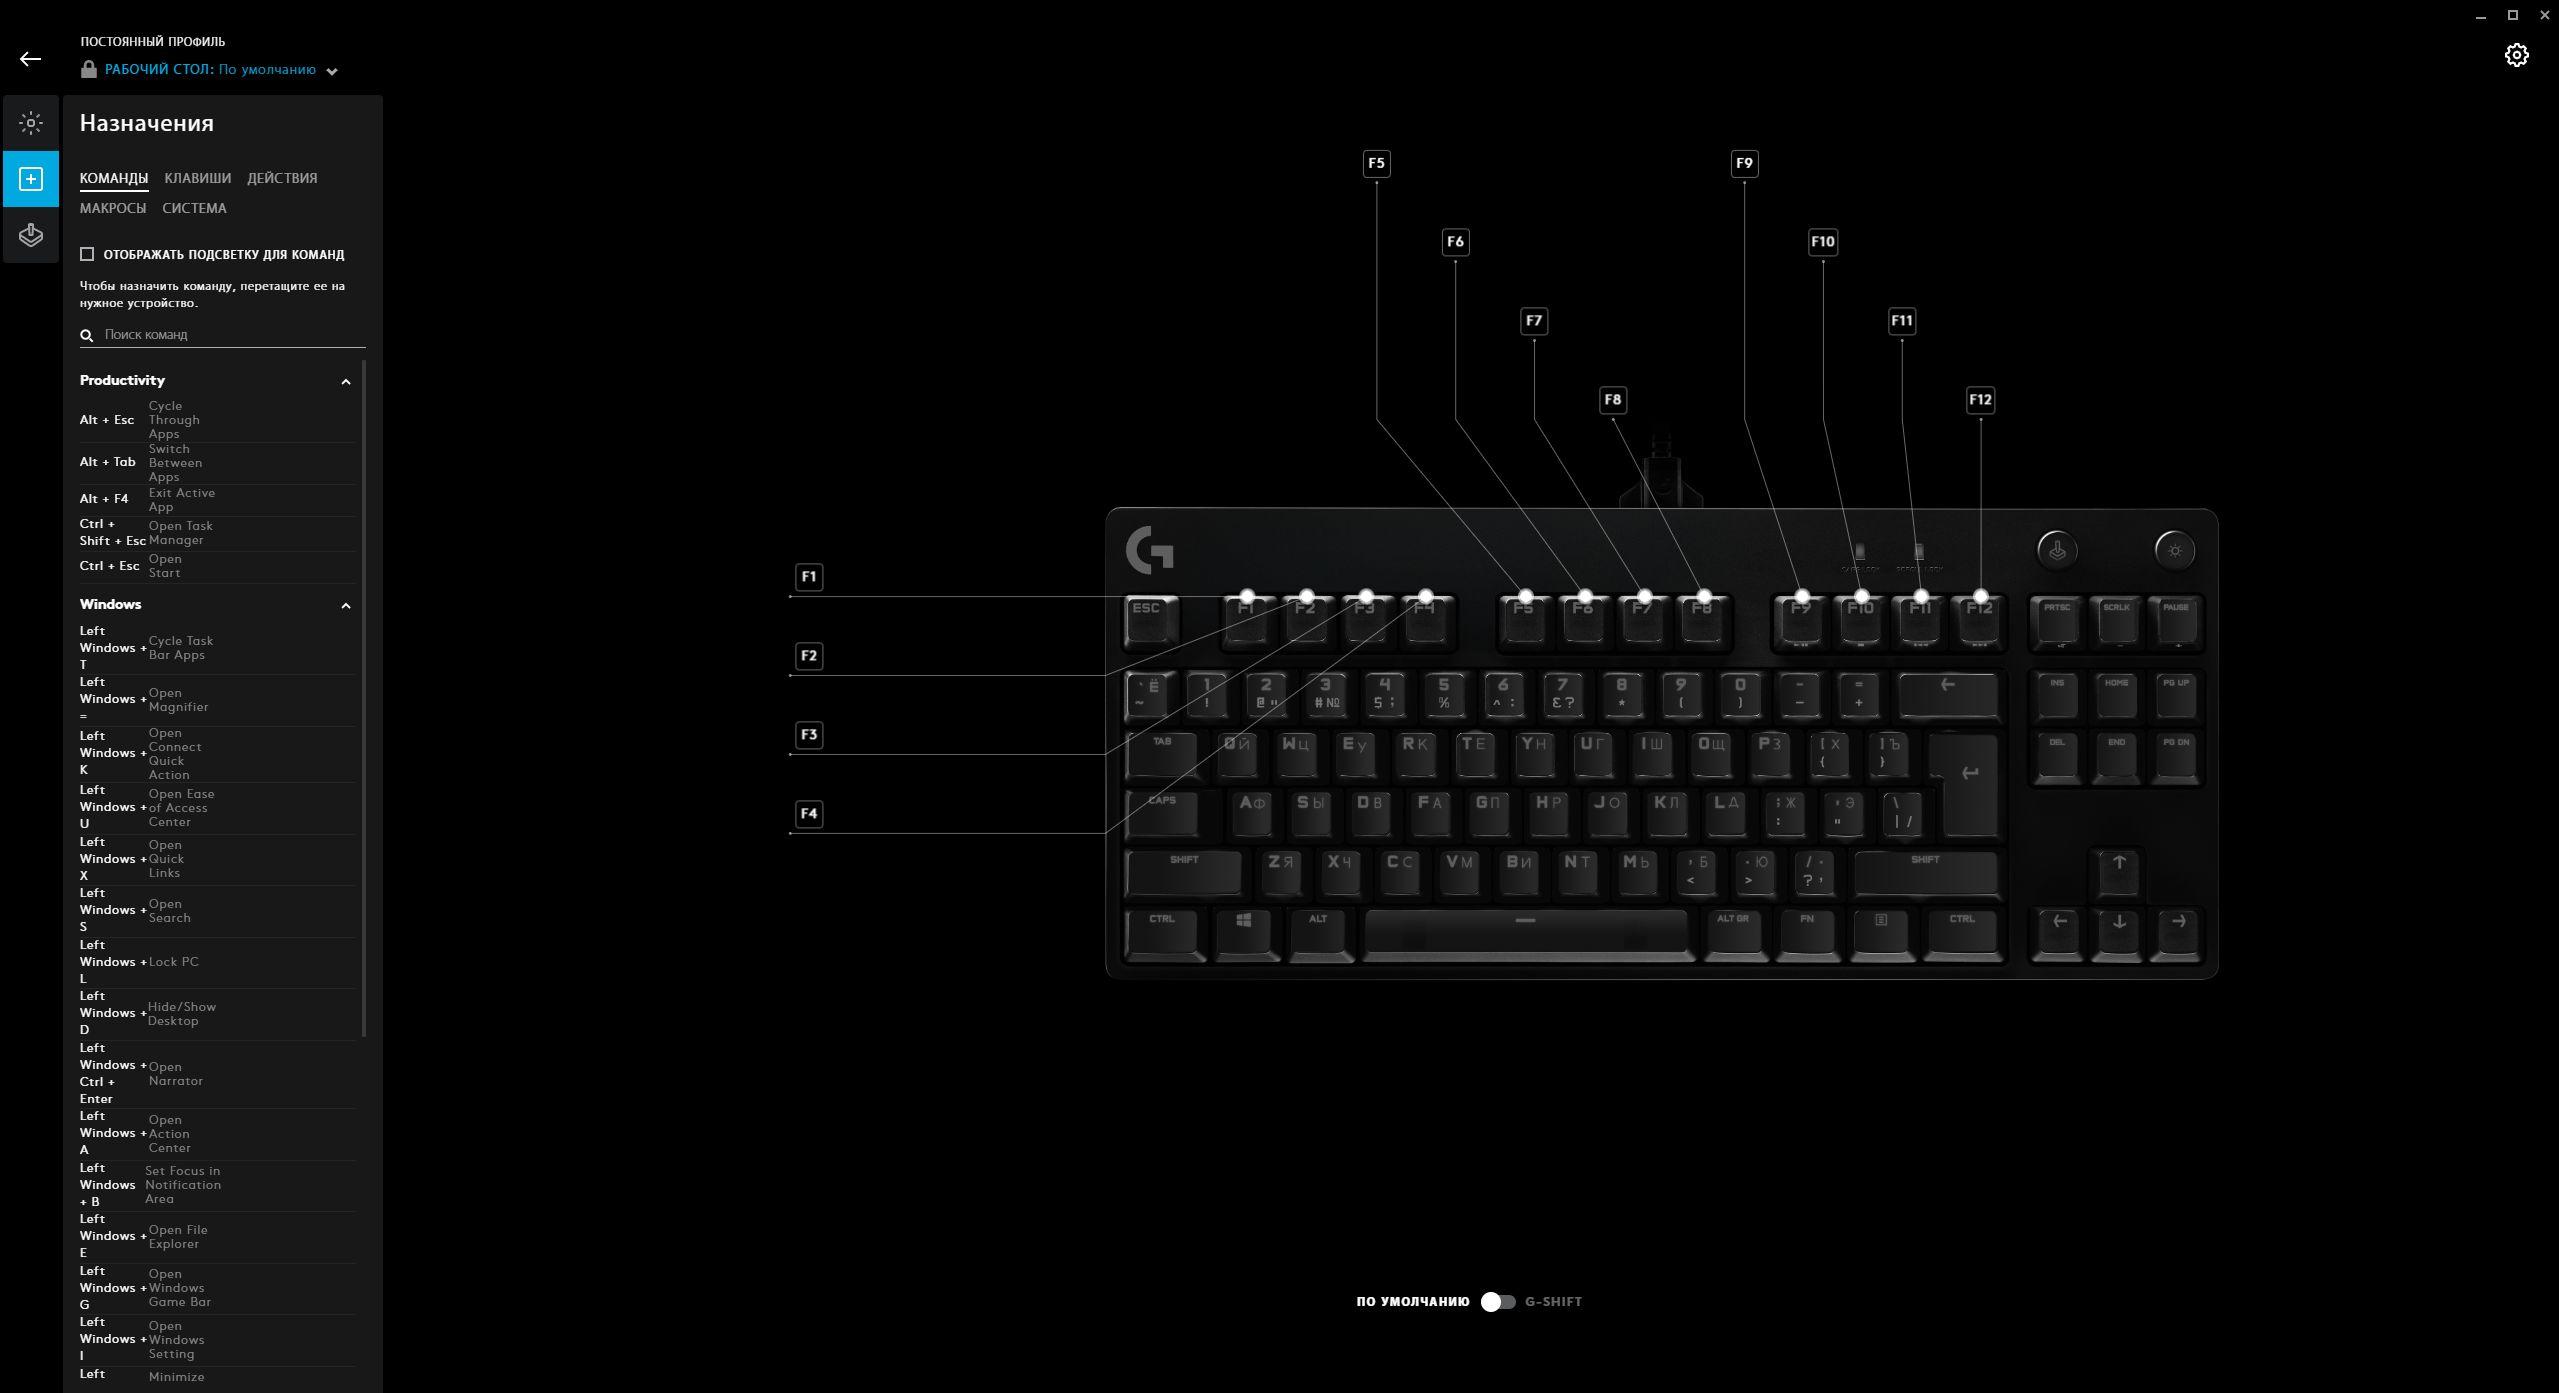 Обзор клавиатуры Logitech G Pro GX Blue Clicky